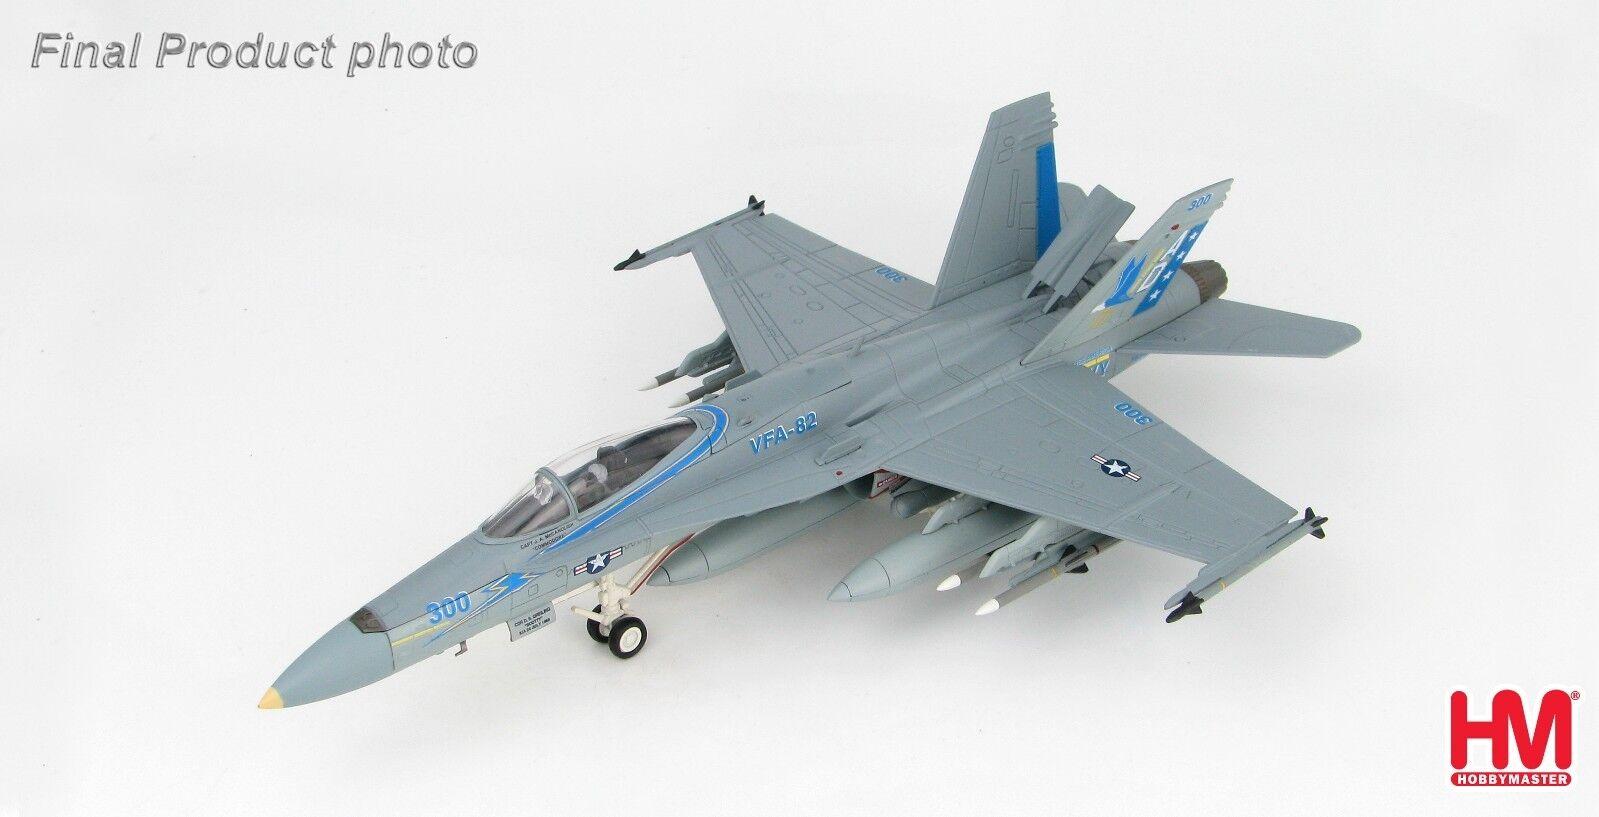 Hobby Master HA3539, HA3539, HA3539, McDonnell Douglas F A-18C, BuNo163459, VFA-82  CAG , USS A 1827a2